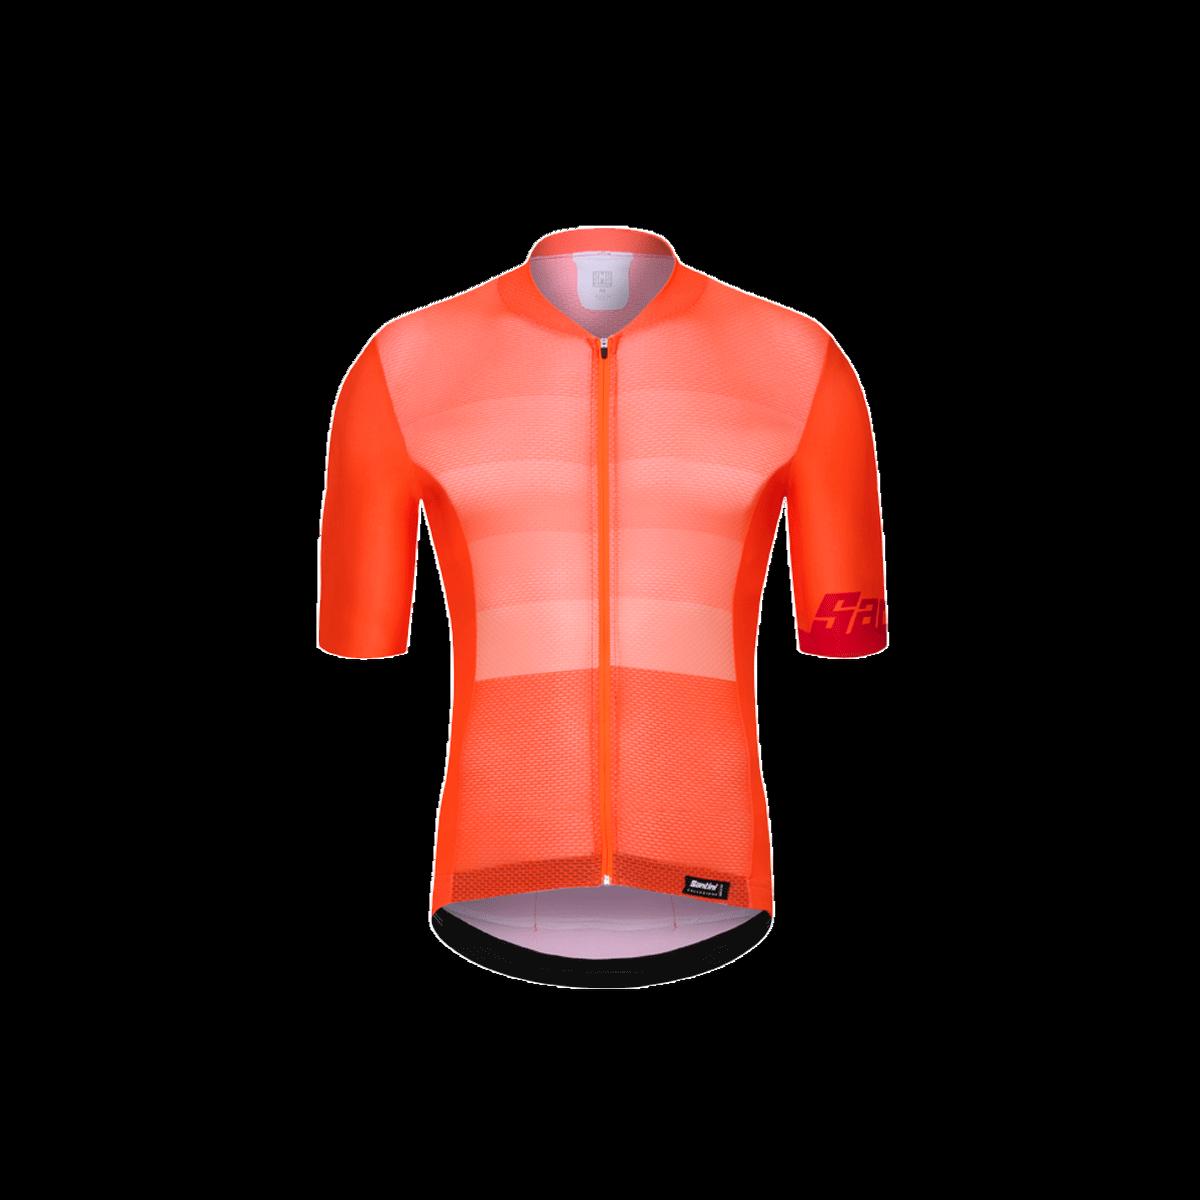 Santini Tono Short Sleeve Cycling Jersey - Fluo Orange